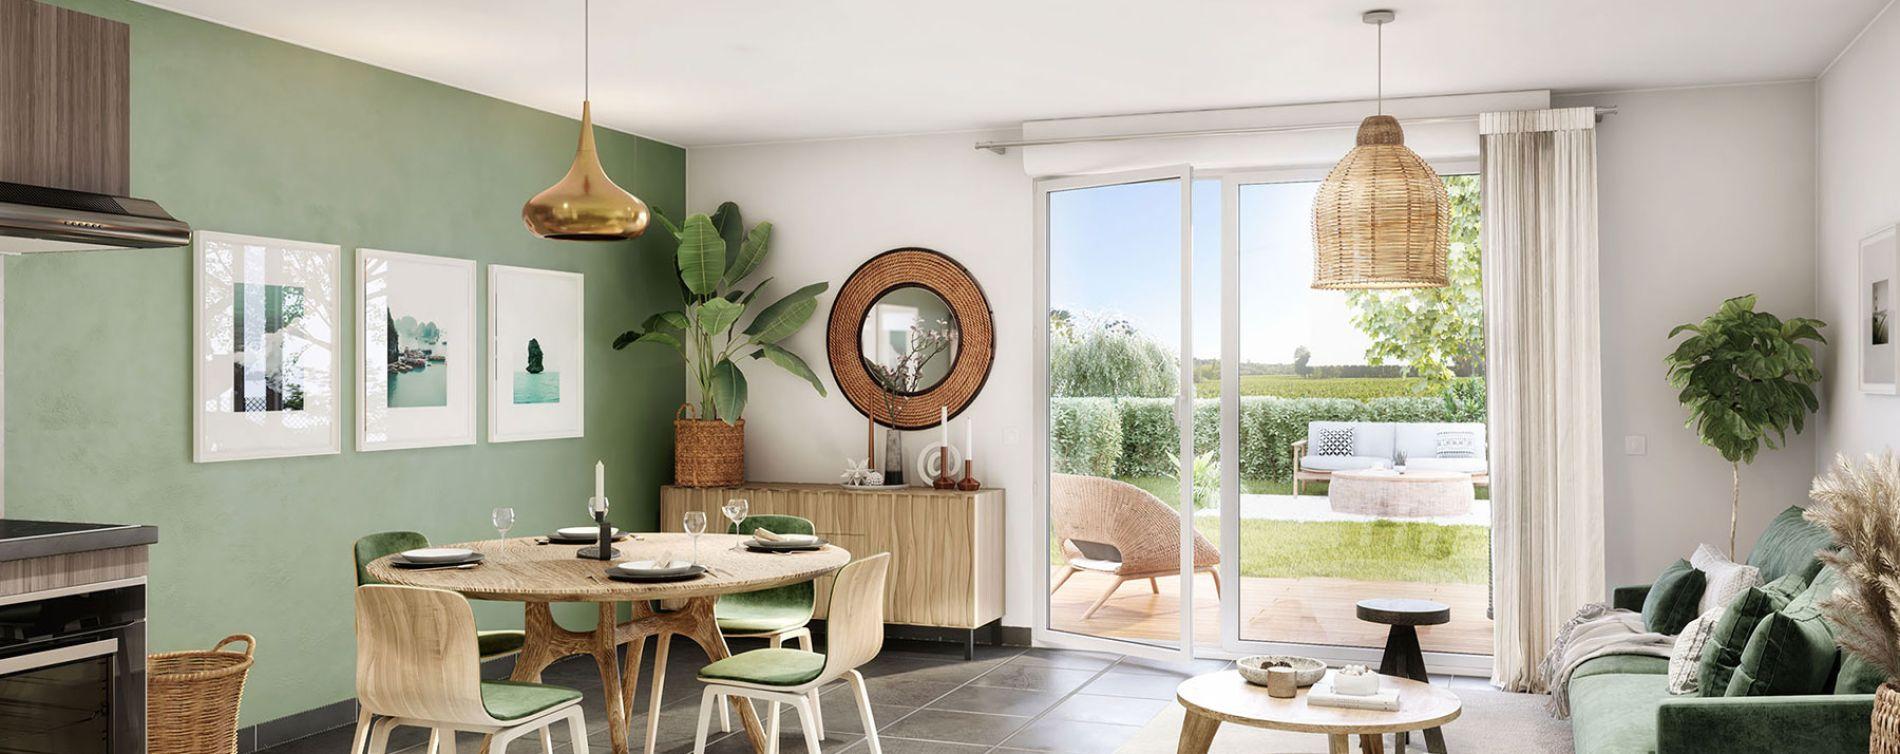 Sainte-Eulalie : programme immobilier neuve « Vista Vinia » (3)